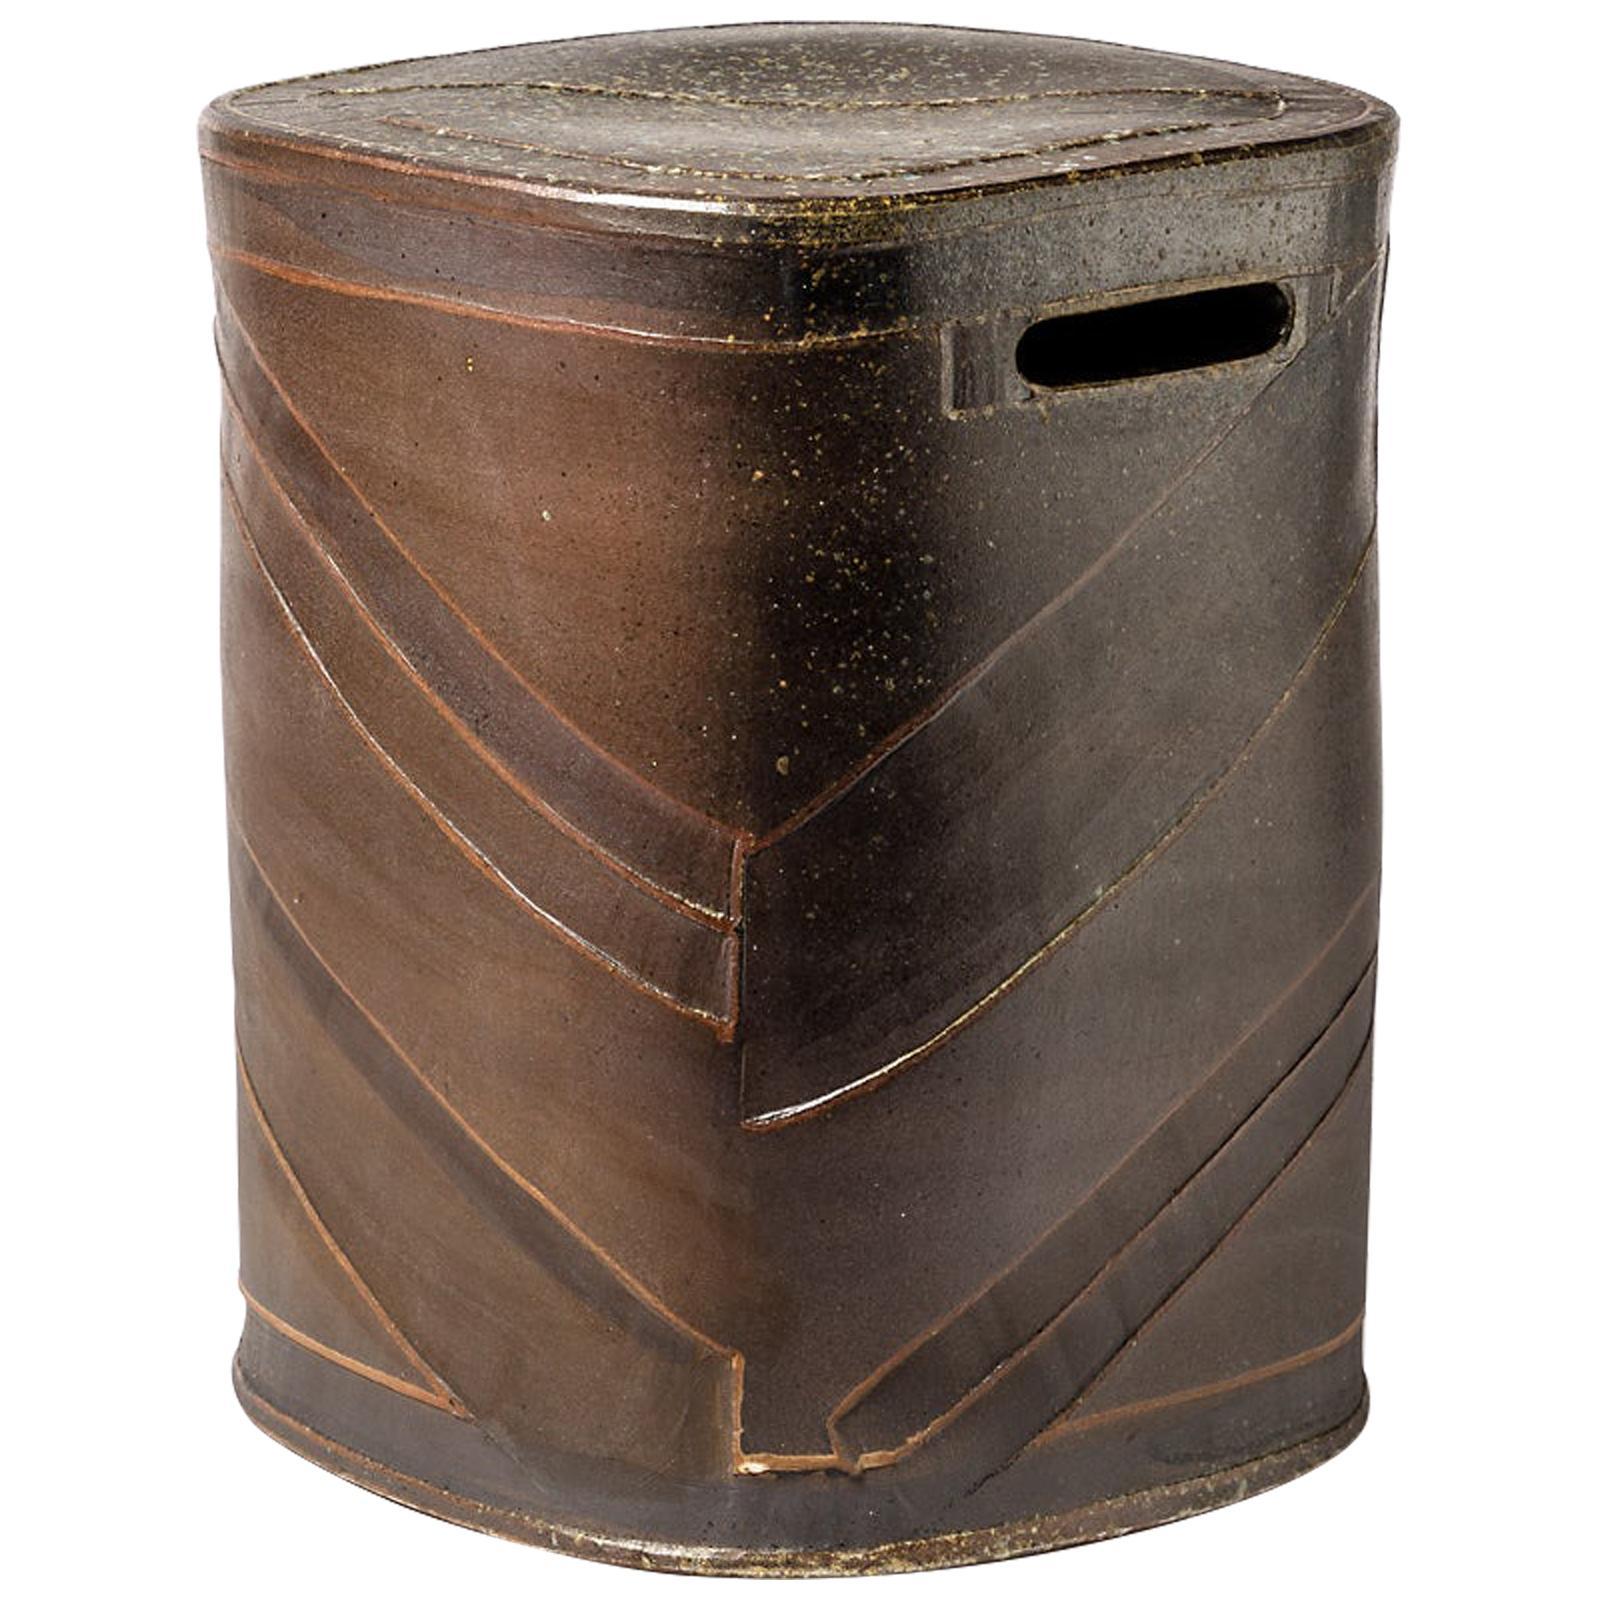 Black Stoneware Ceramic Stool by Roz Herrin La Borne Decoration Table 10/11